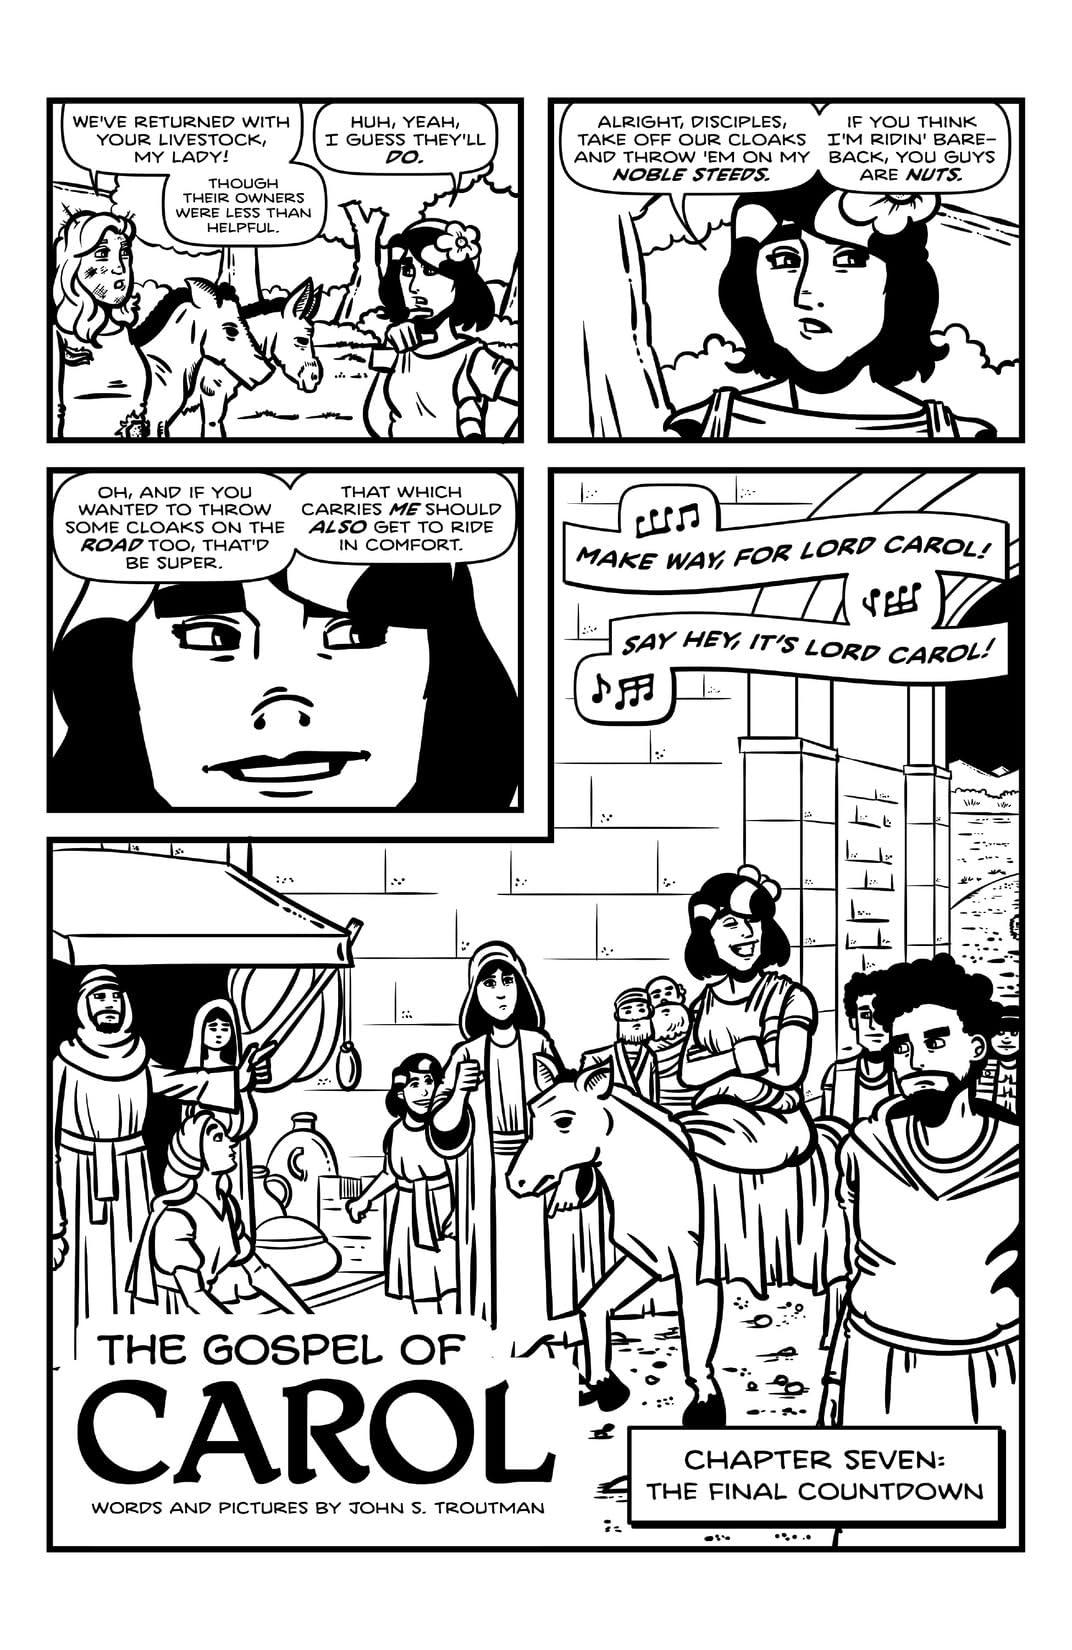 The Gospel of Carol #7